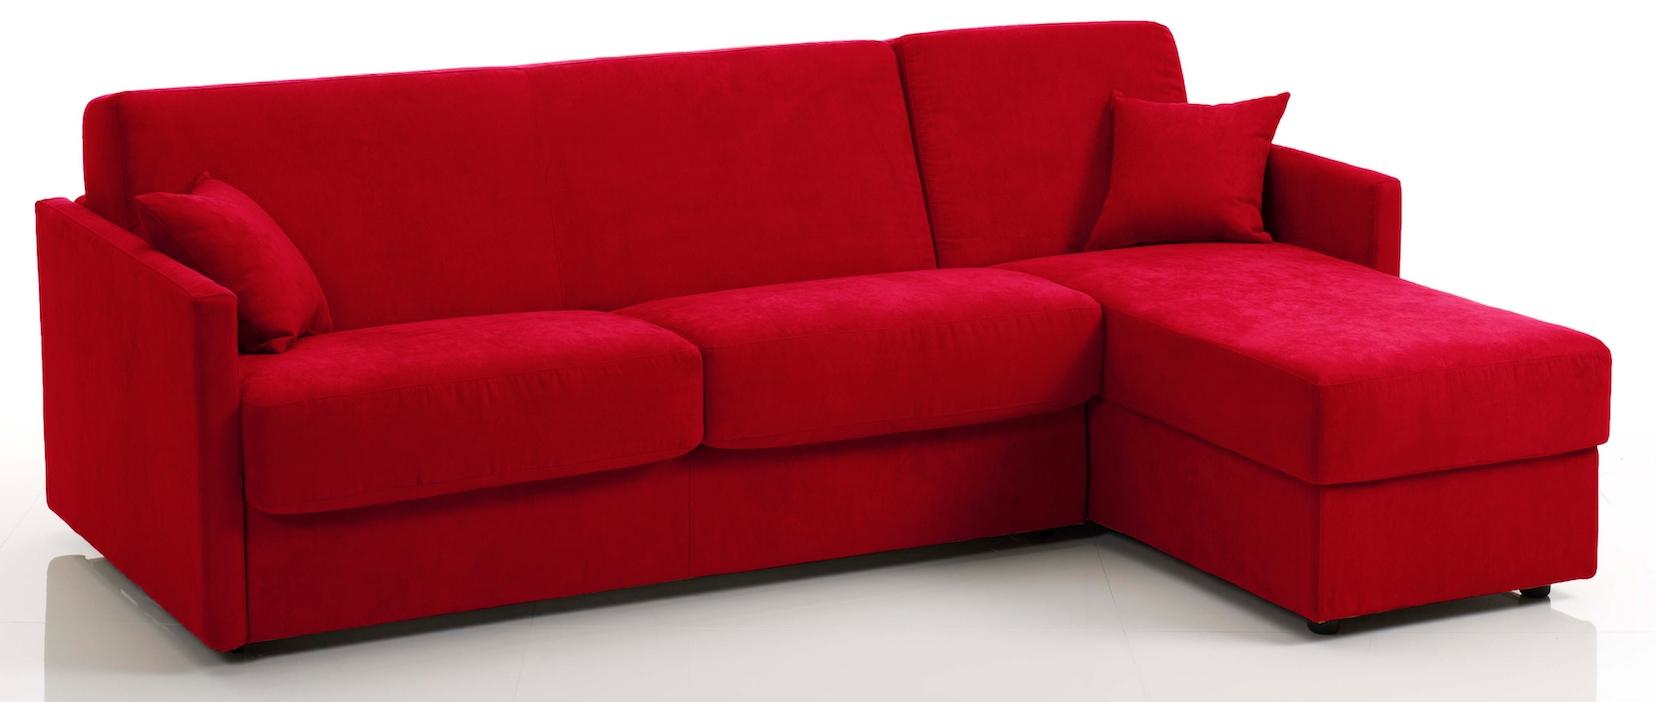 Canap d angle convertible tissu rouge cika mod le 3 - Canape d angle rouge ...